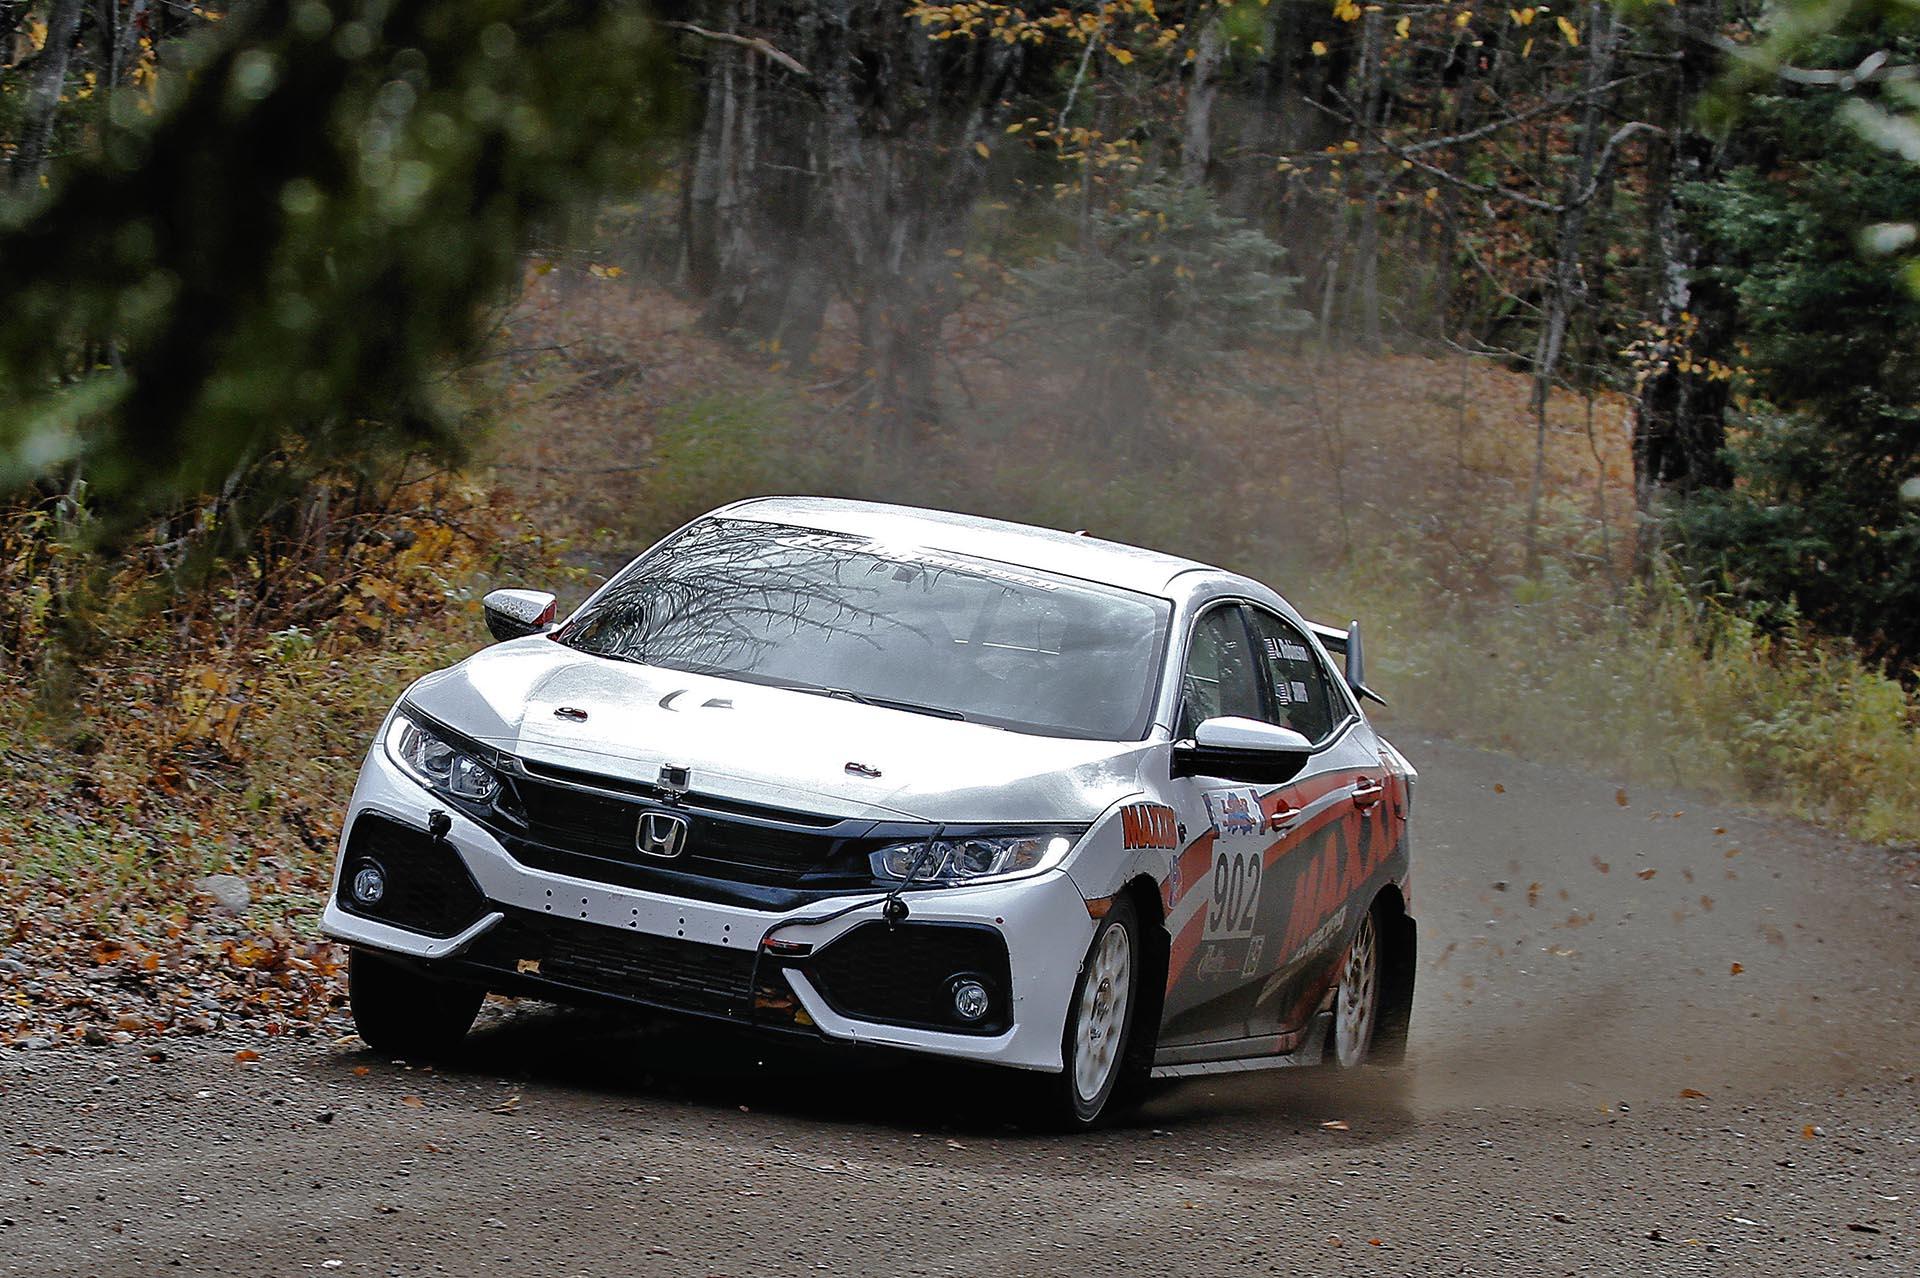 Rally Civic LSPR 2017